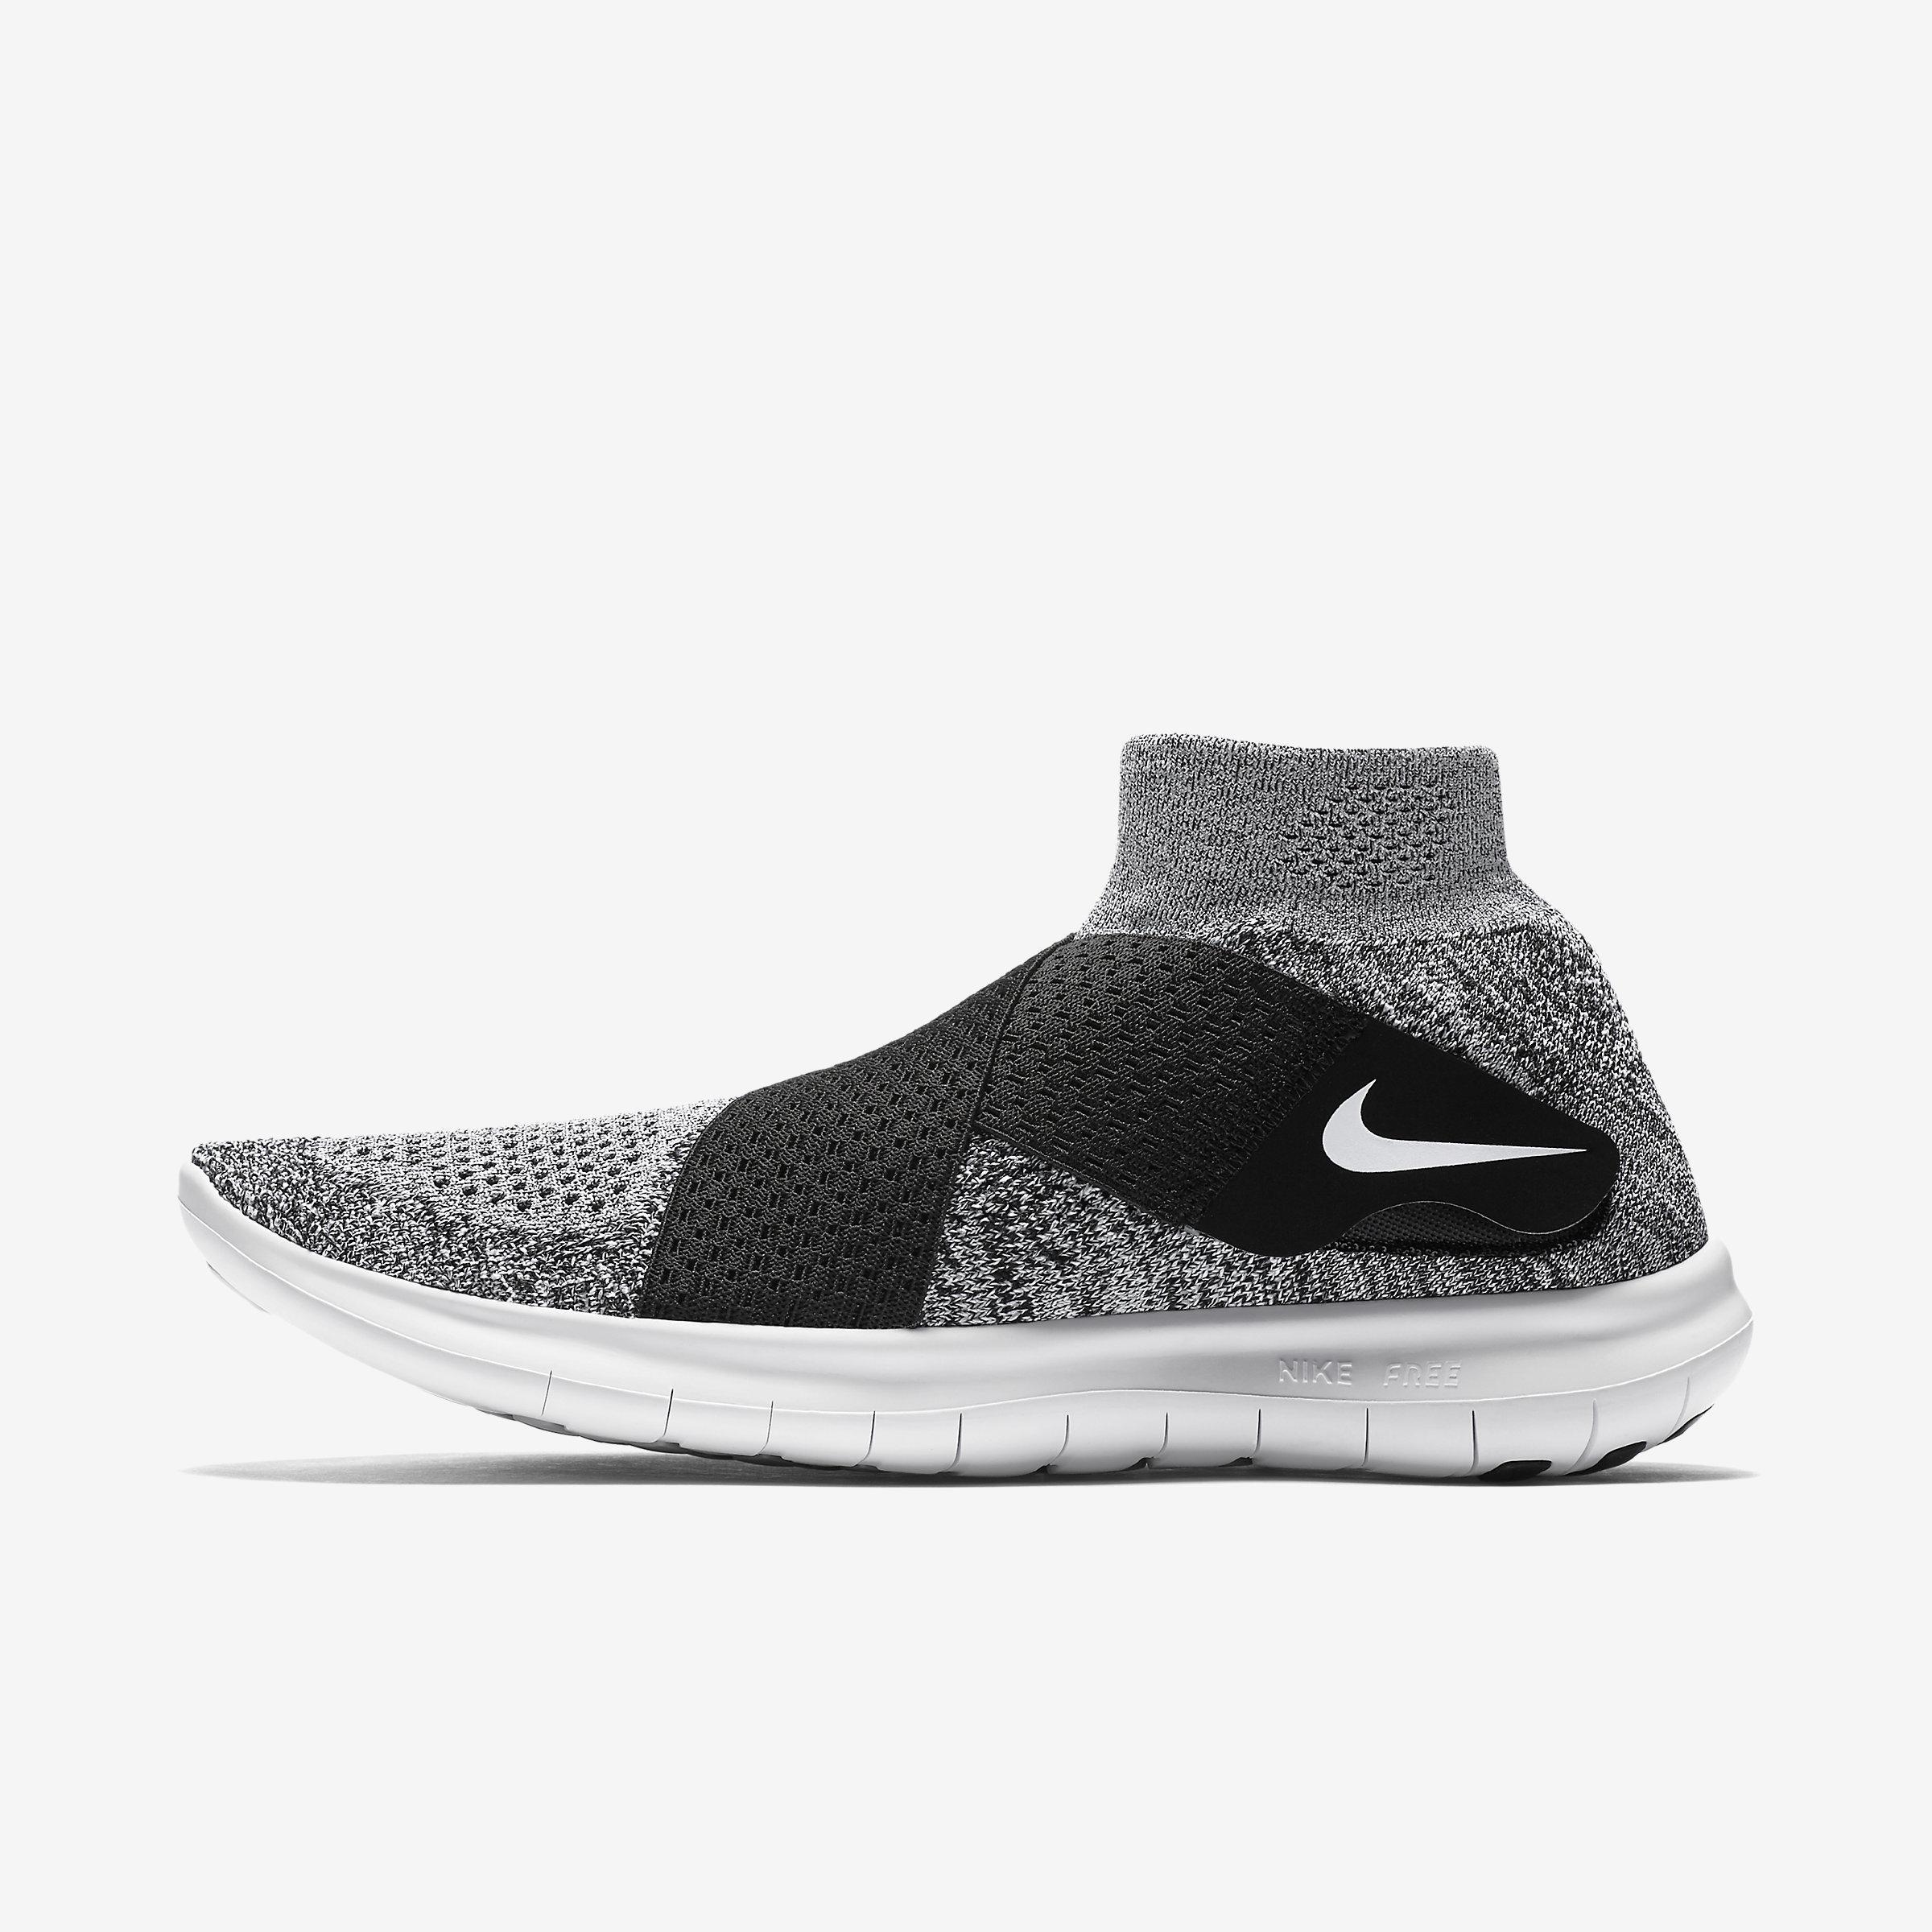 41174587d420 Nike - Multicolor Free Rn Motion Flyknit 2017 for Men - Lyst